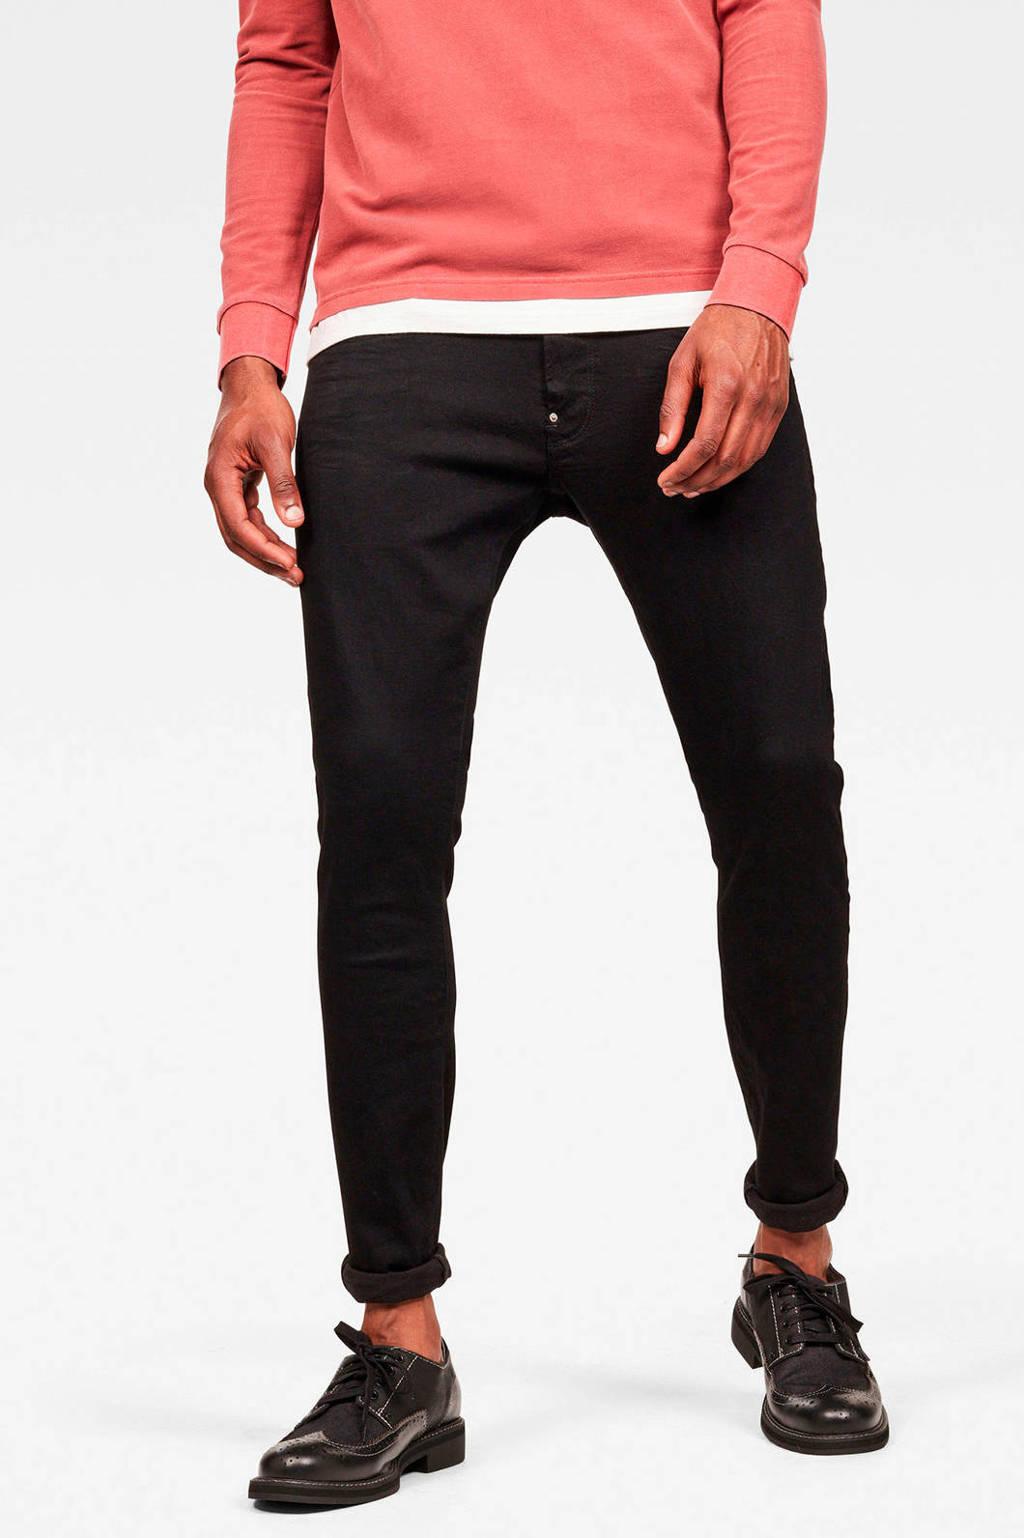 G-Star RAW skinny fit jeans Revend pitch black, PITCH BLACK